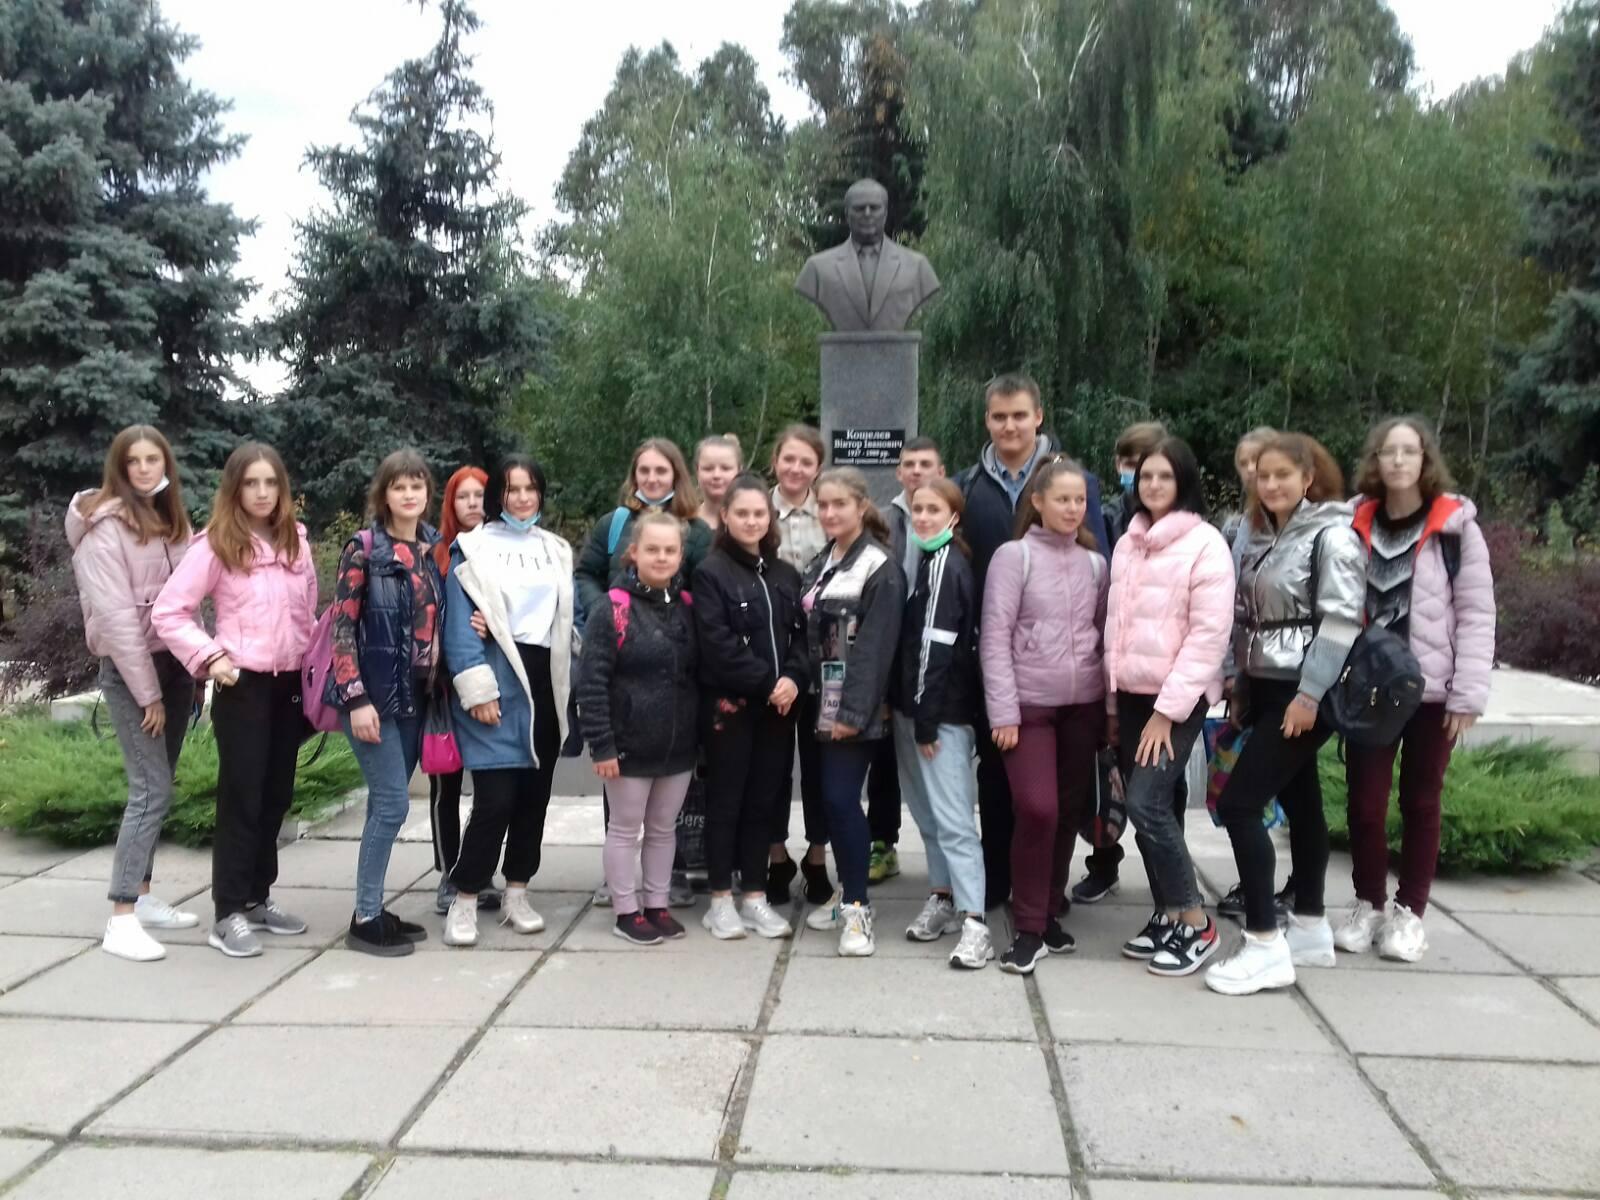 Екскурсія до Палацу культури ім. В. І. Кошелева